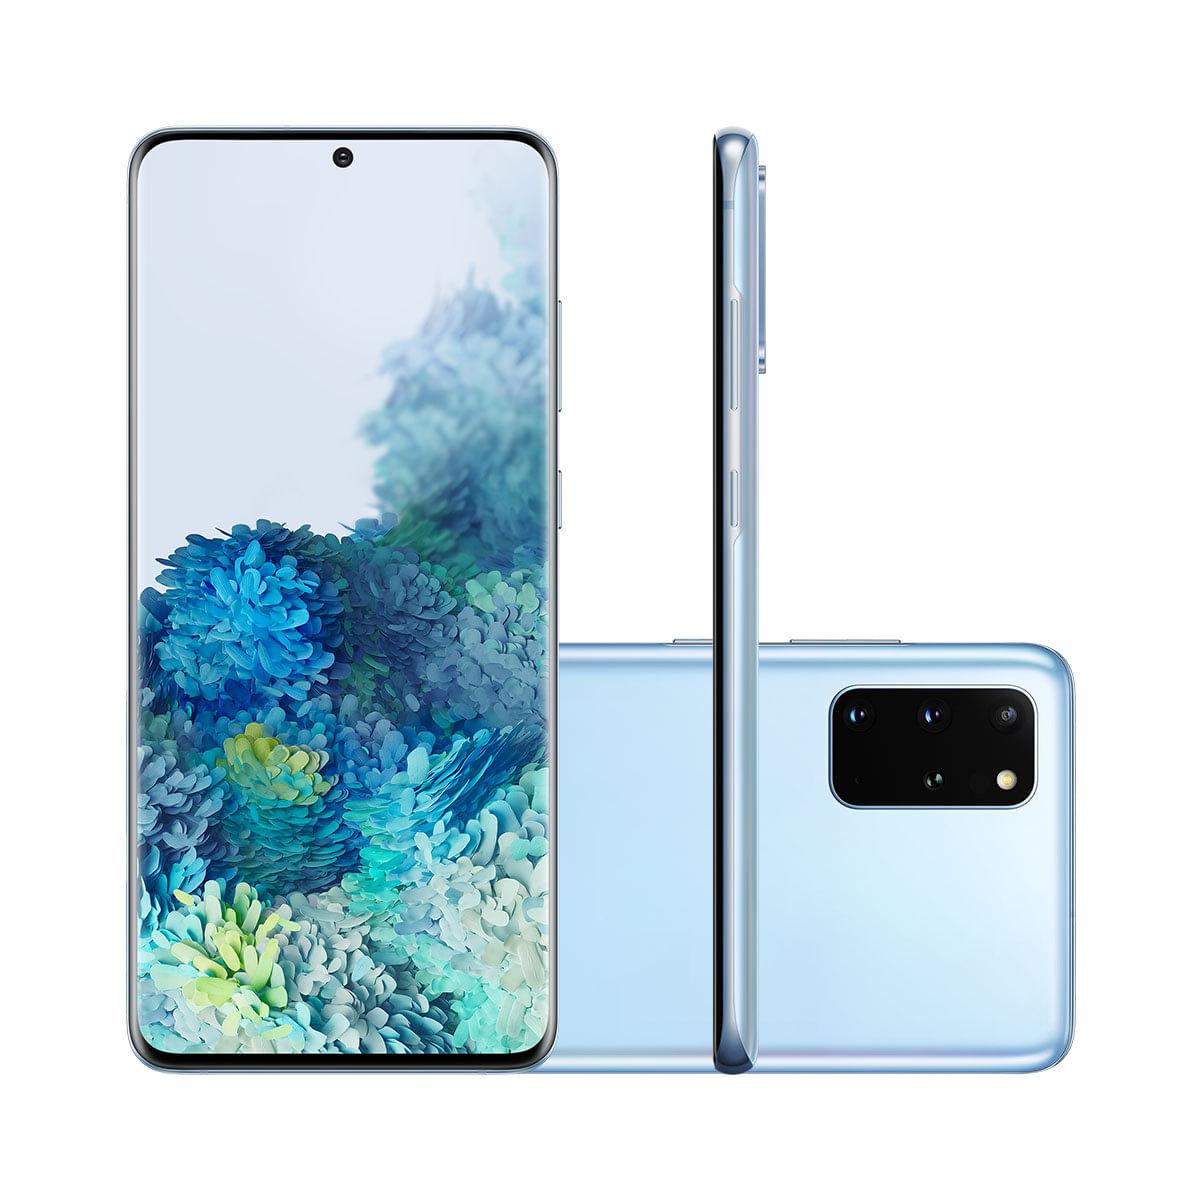 Smartphone Samsung Galaxy S20 Plus 128GB Cloud Blue 4G Tela 6.7 Câmera Quádrupla 64MP Selfie 10MP Android 10